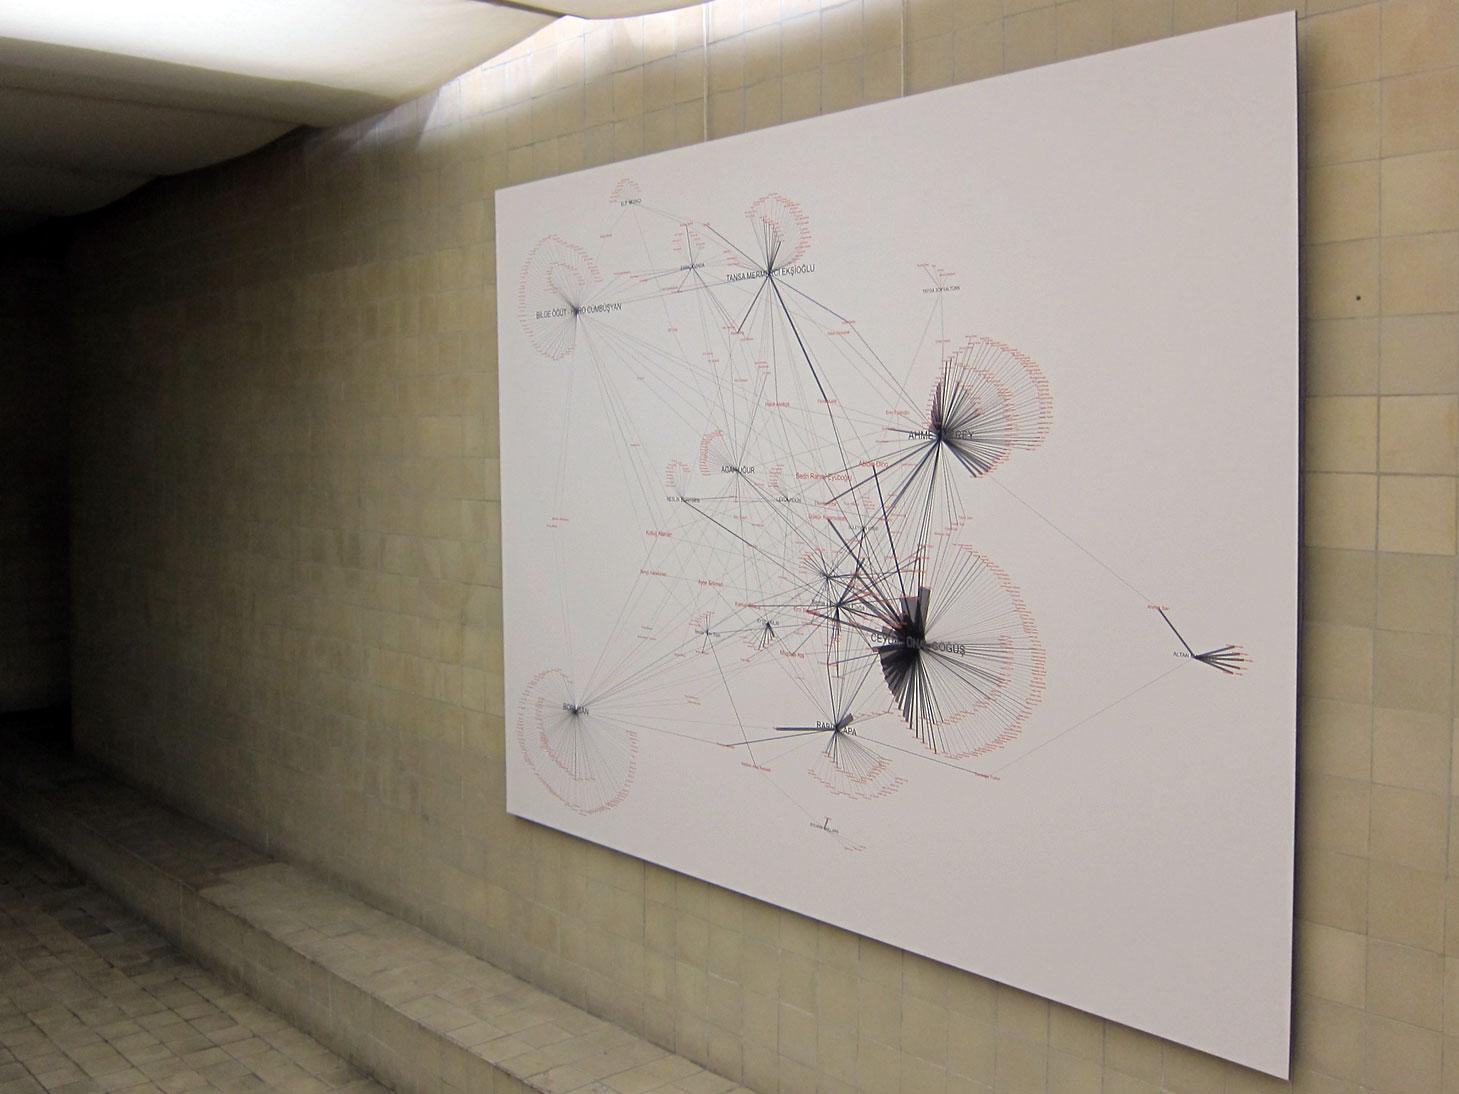 Artist Collector Network: Phase II, Maçka Sanat Galerisi, Istanbul, 2011.